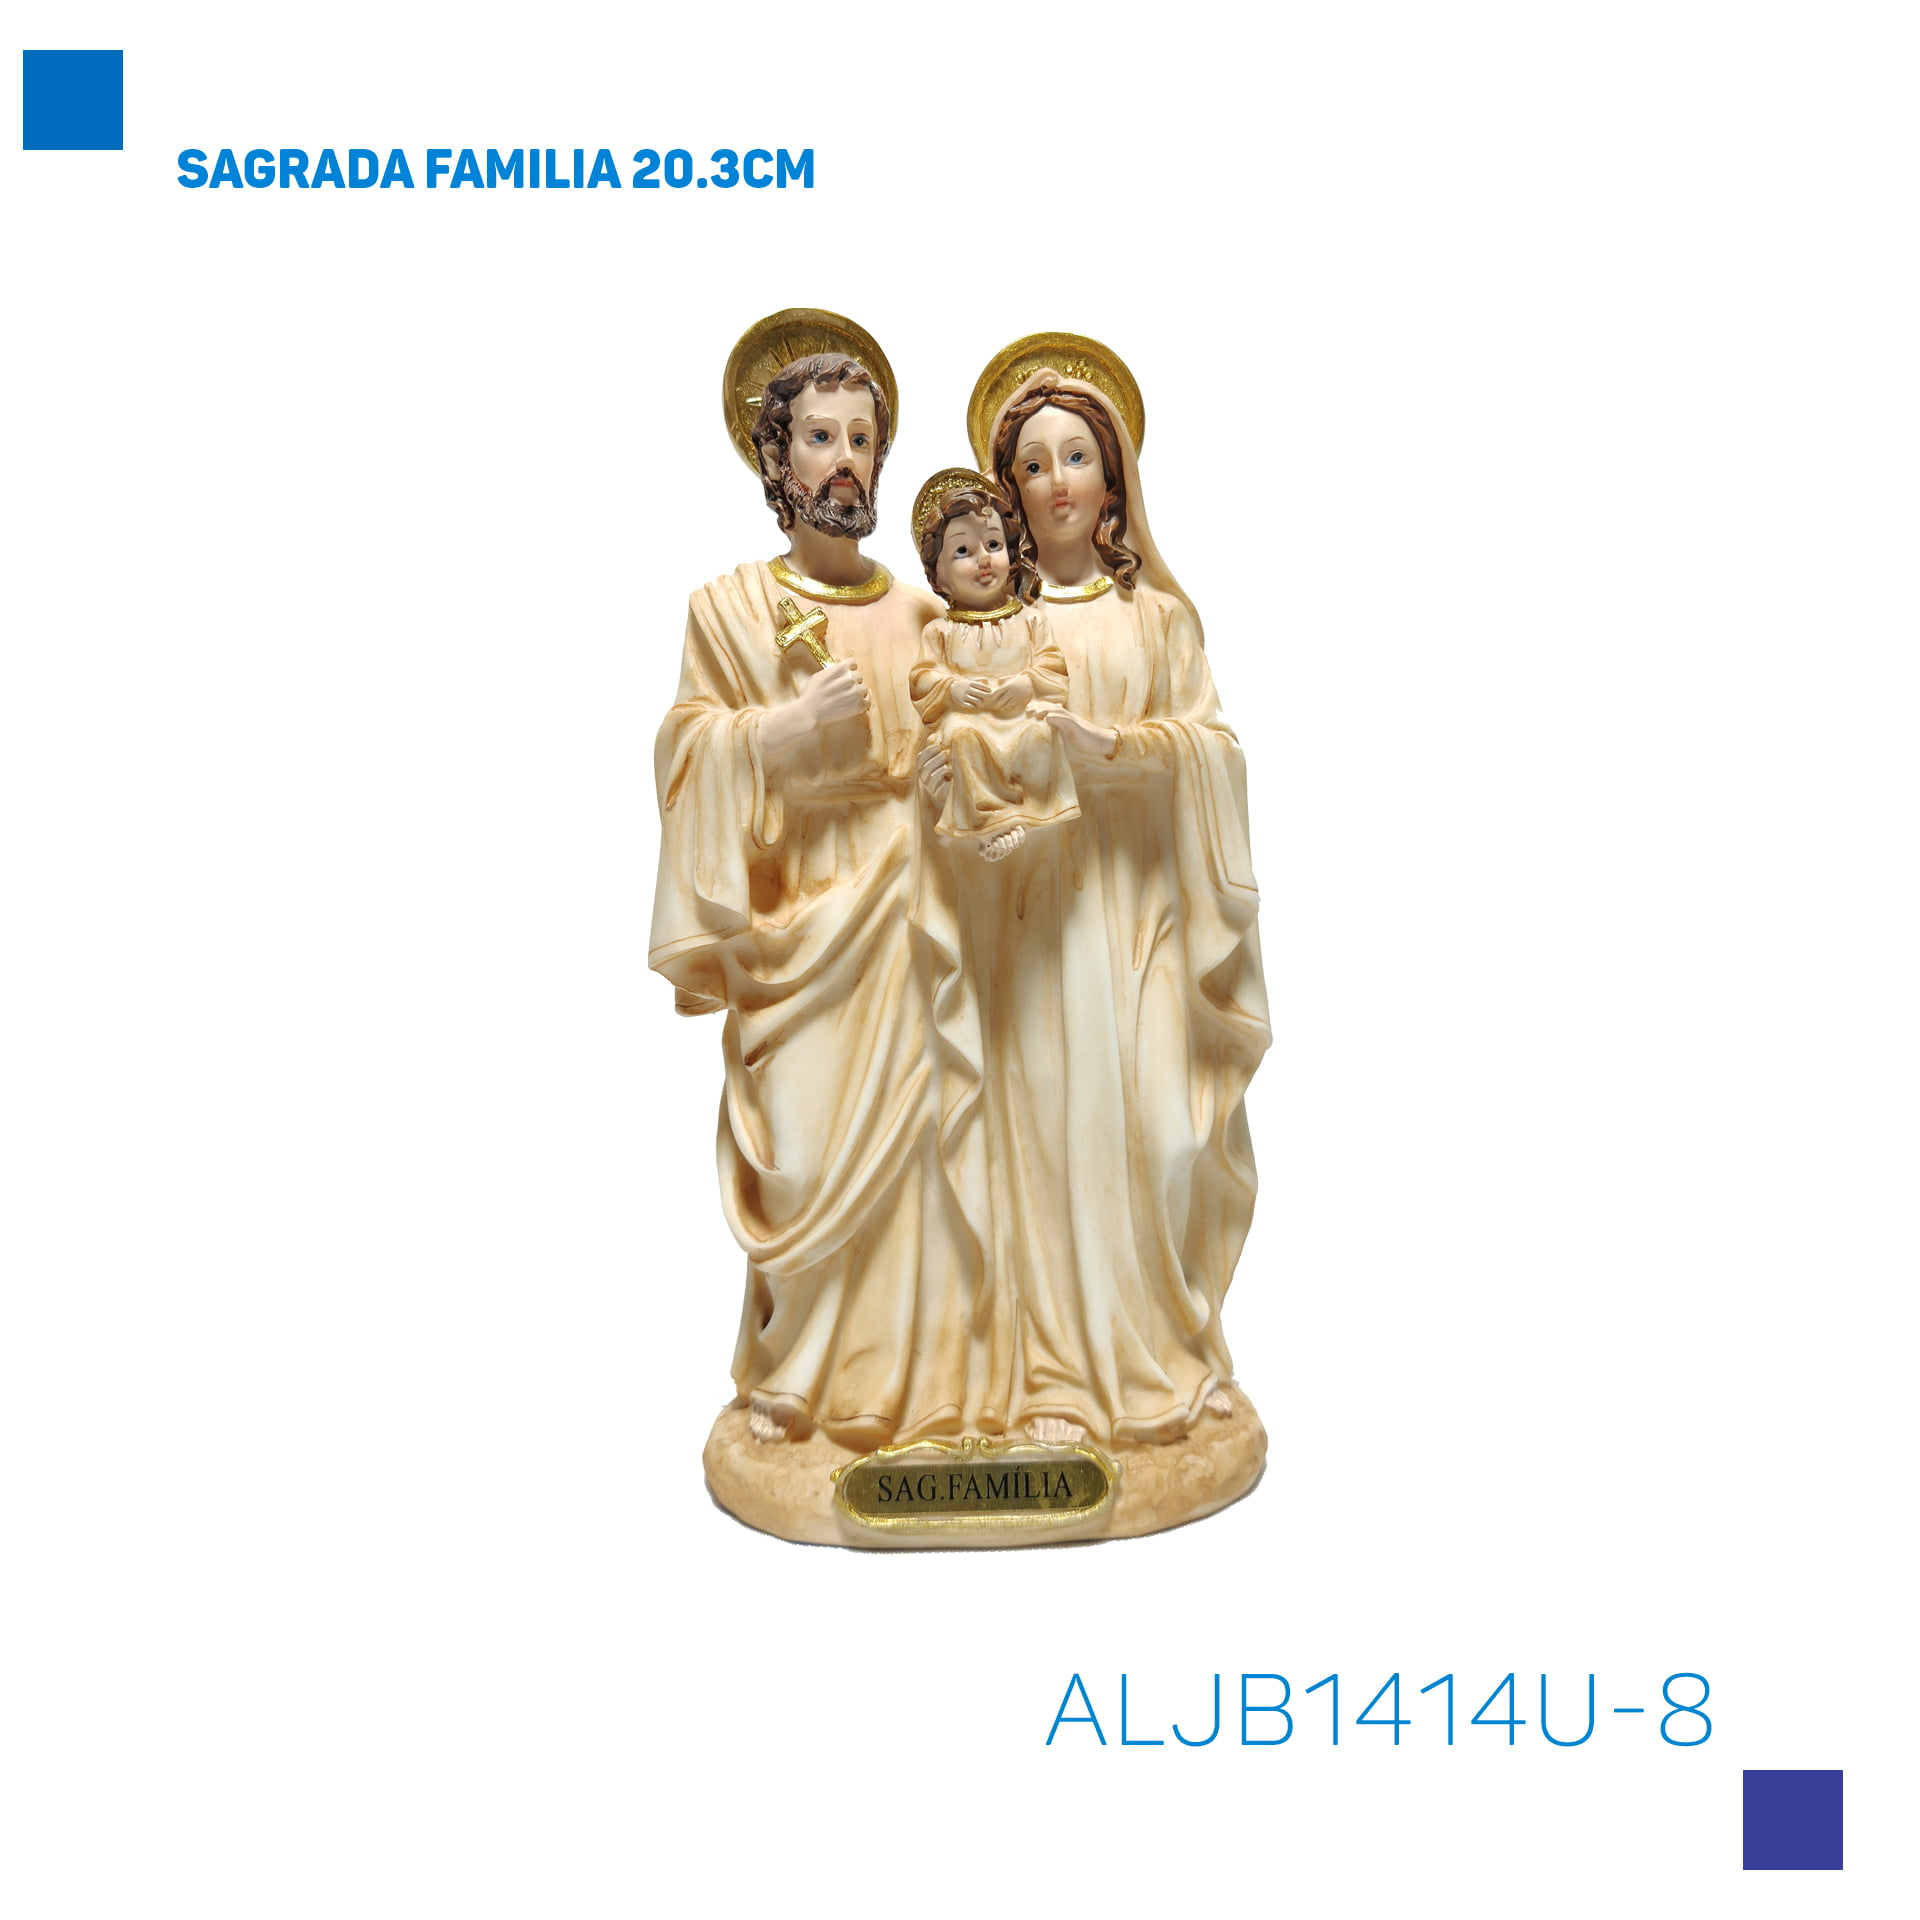 Bira Artigos Religiosos - SAGRADA FAMILIA 20.3CM - Cód. ALJB1414U-8